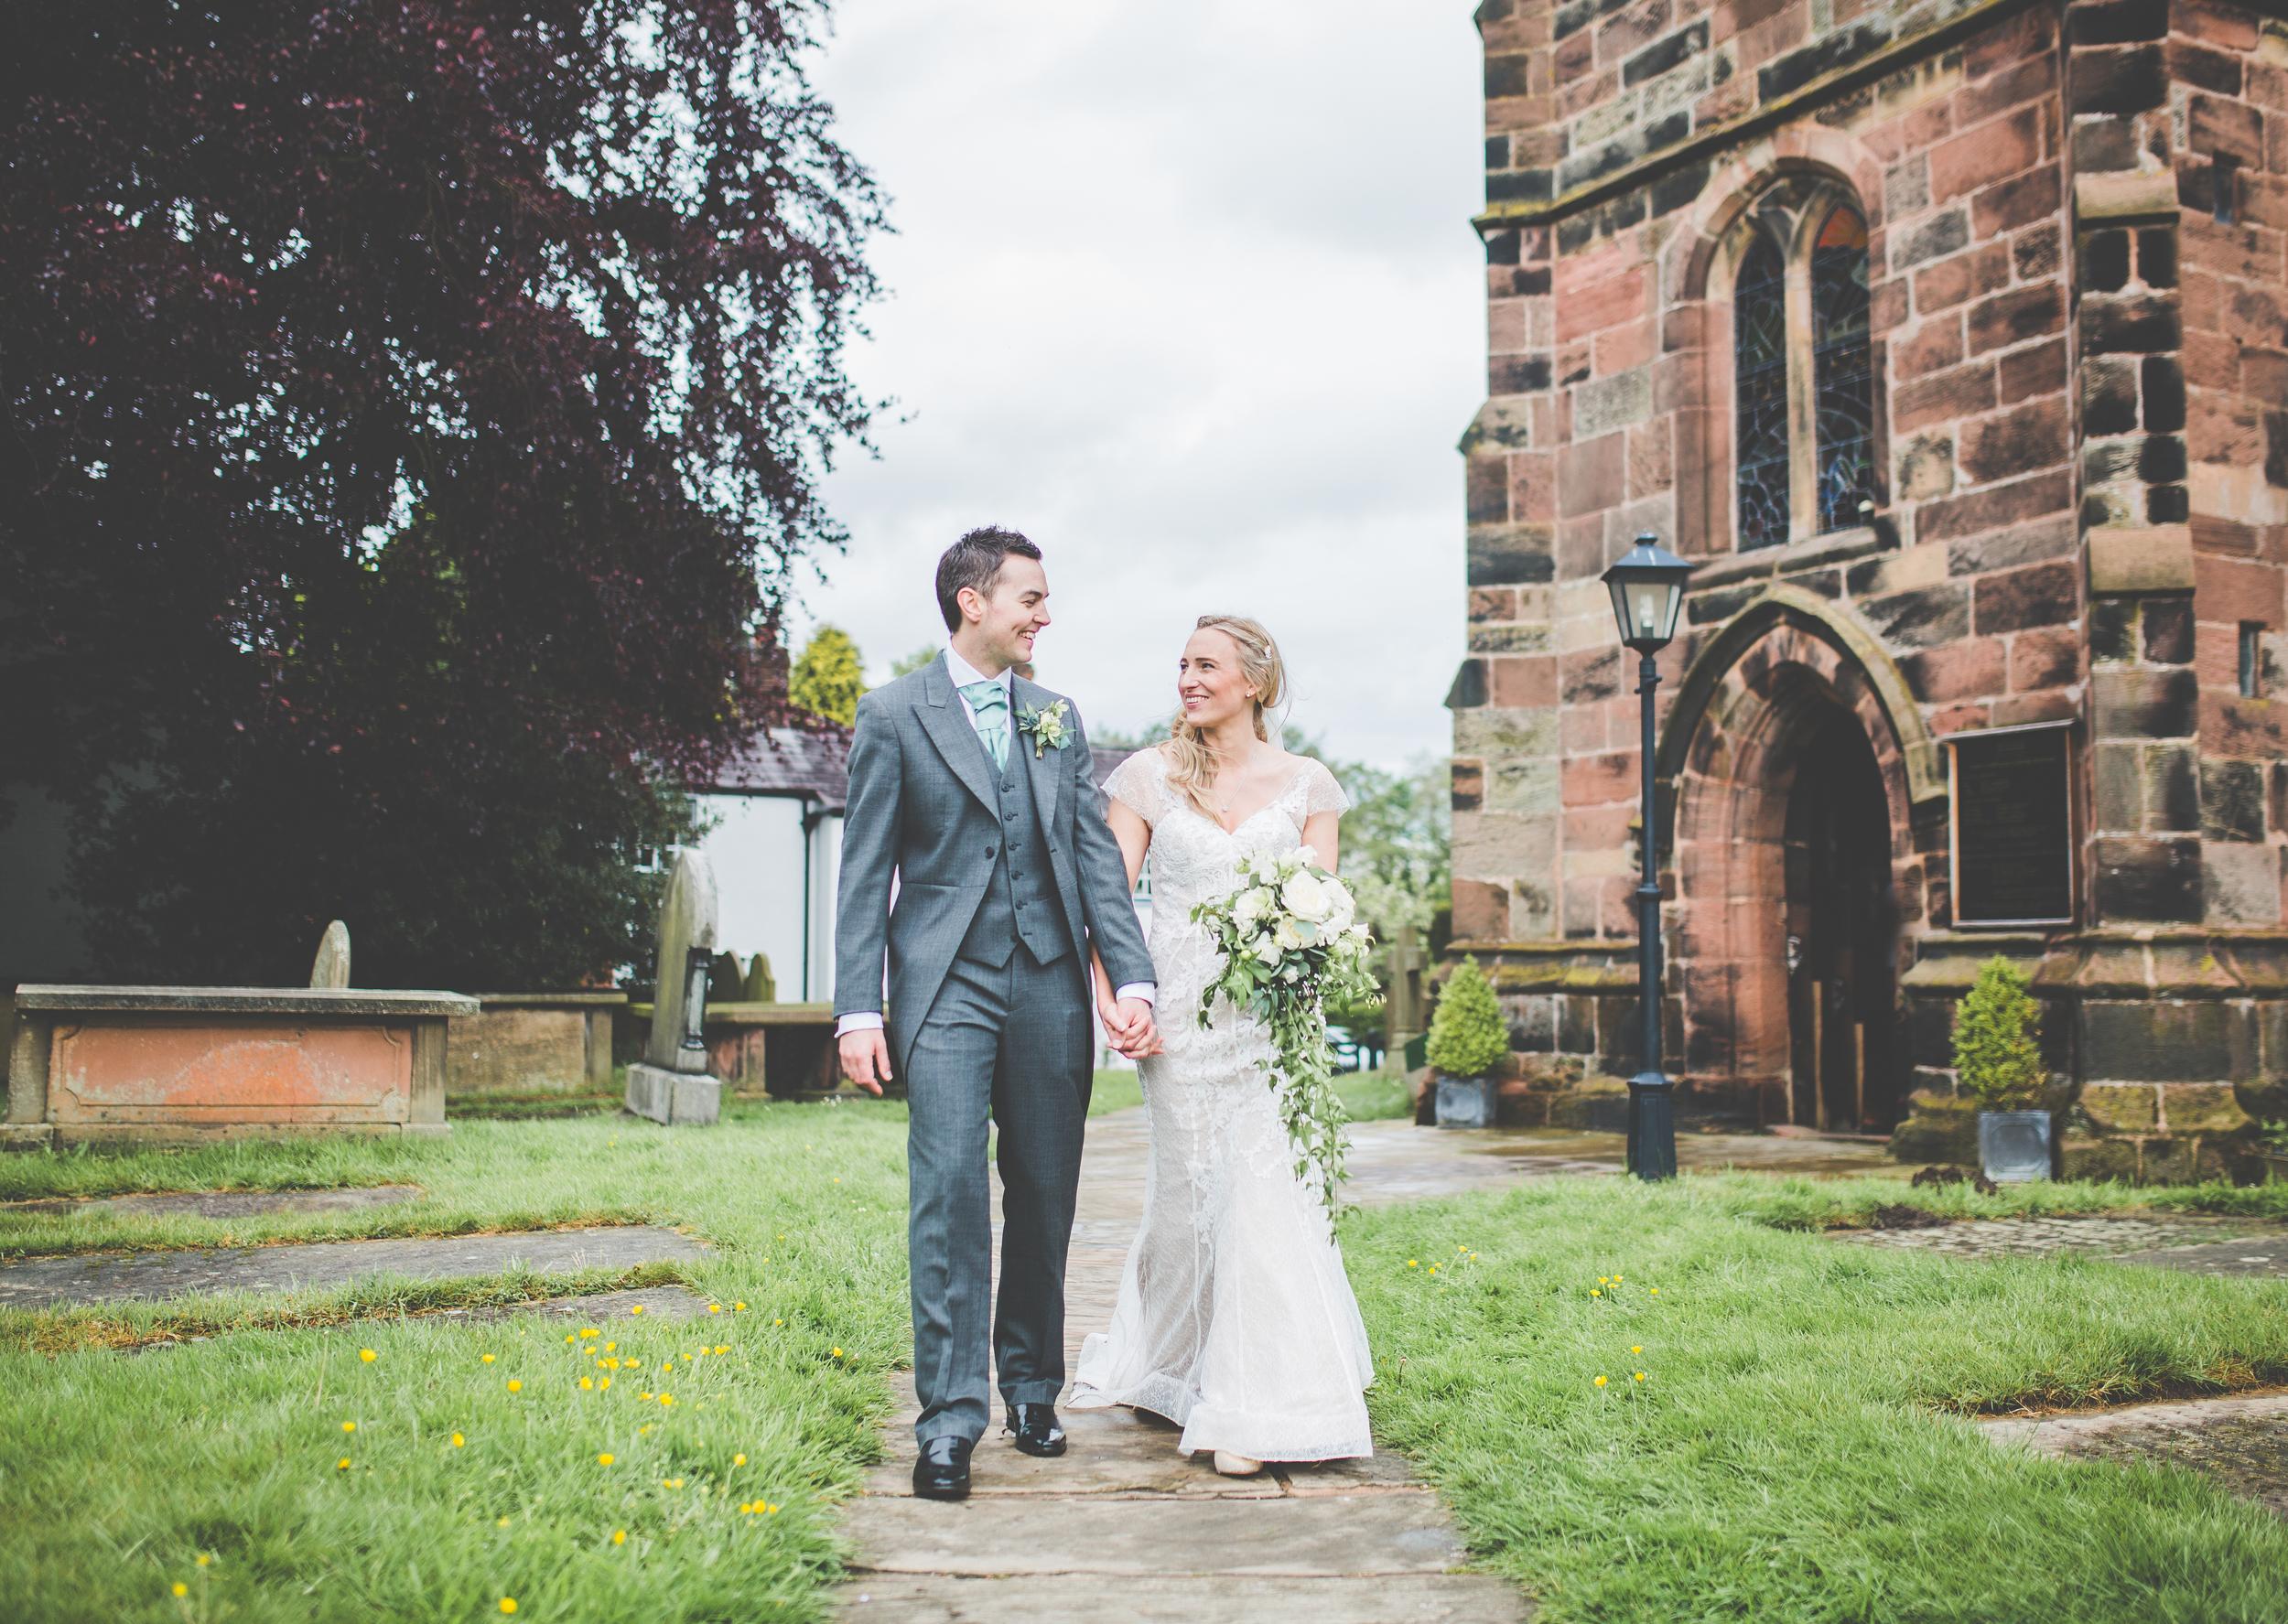 portraits outside church - wedding photography Cheshire